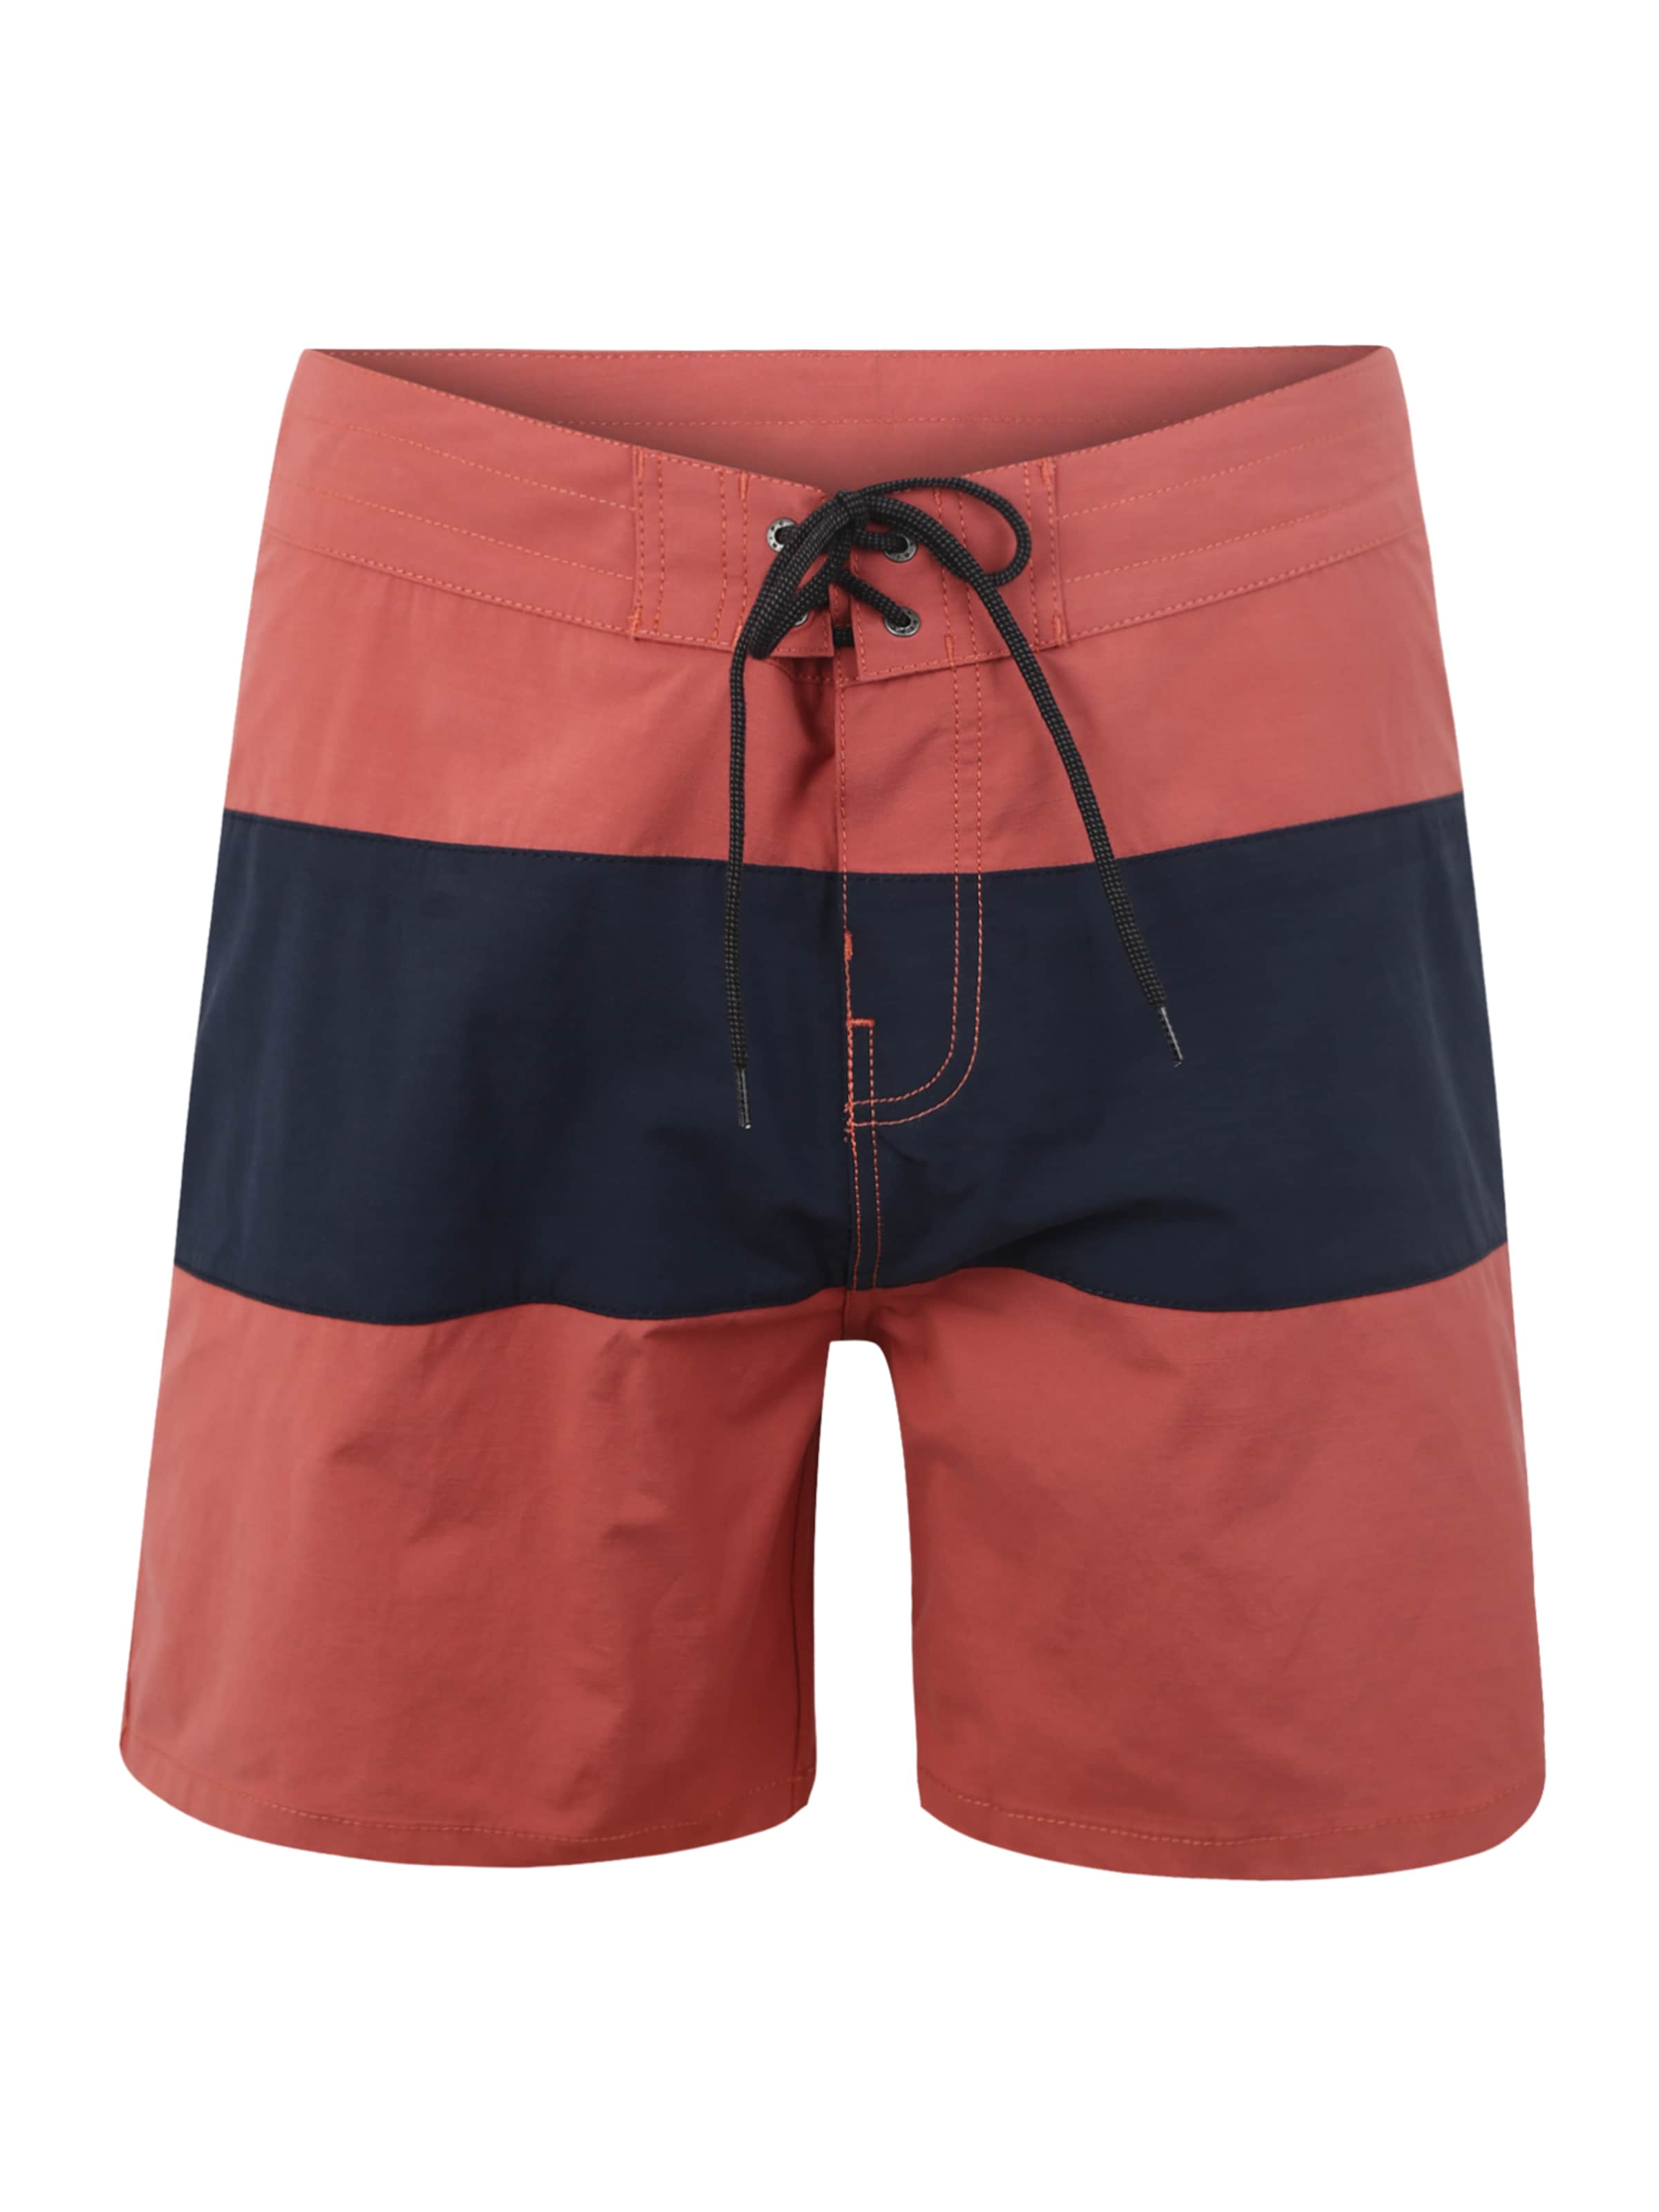 Rouge Shorts Rip De Paneled En Bleu Curl 'retro Bain 17''' PzPxTrqw